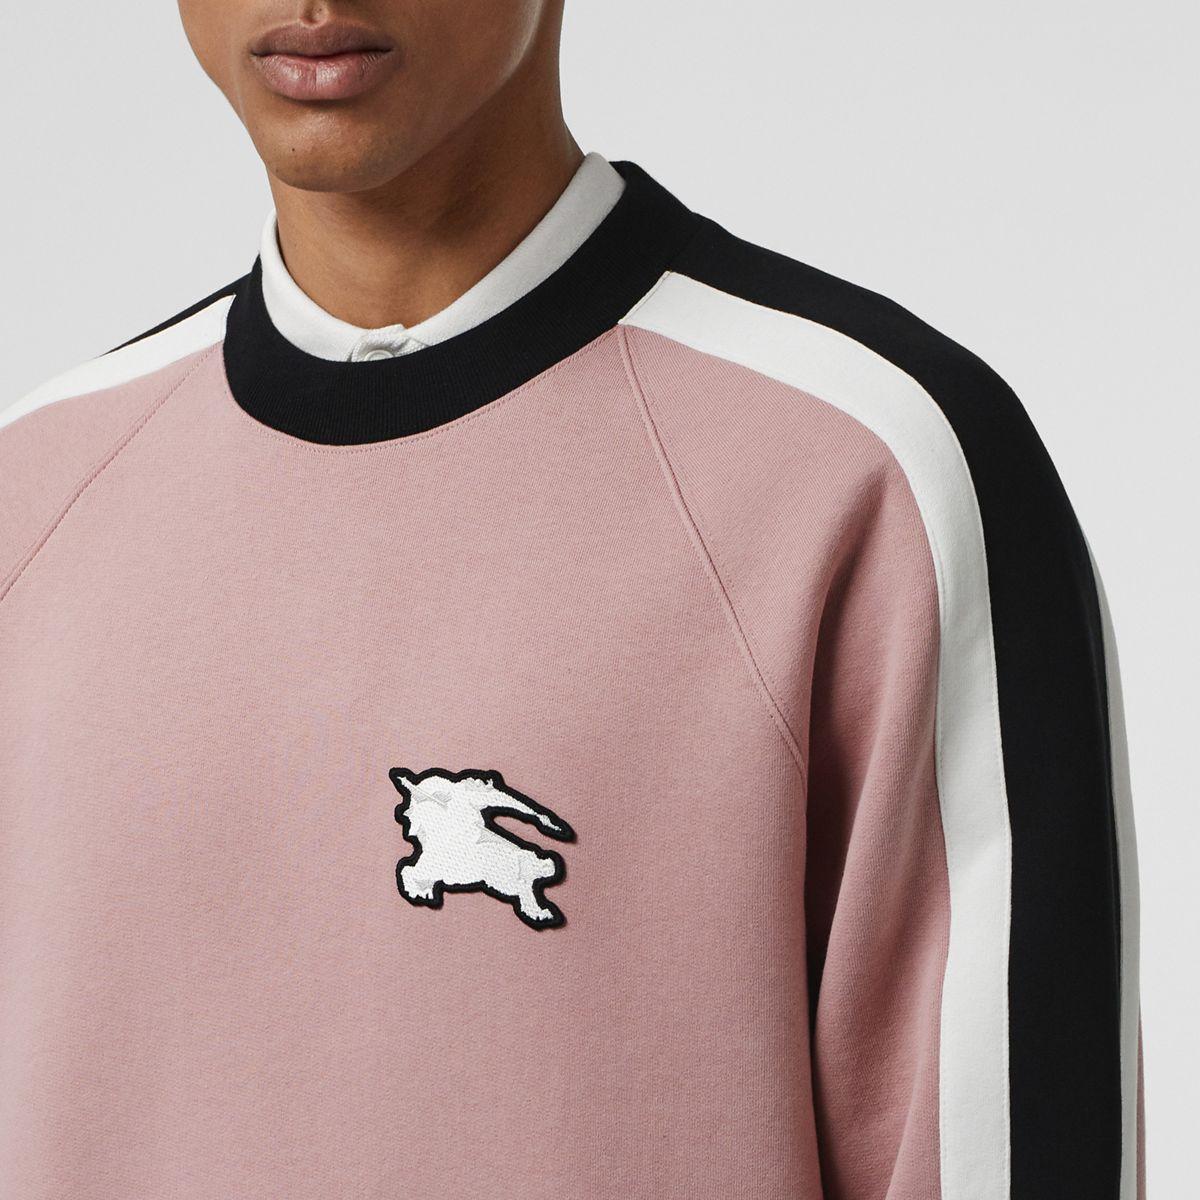 945a9a1e821d Lyst - Burberry Stripe Detail Cotton Jersey Sweatshirt for Men